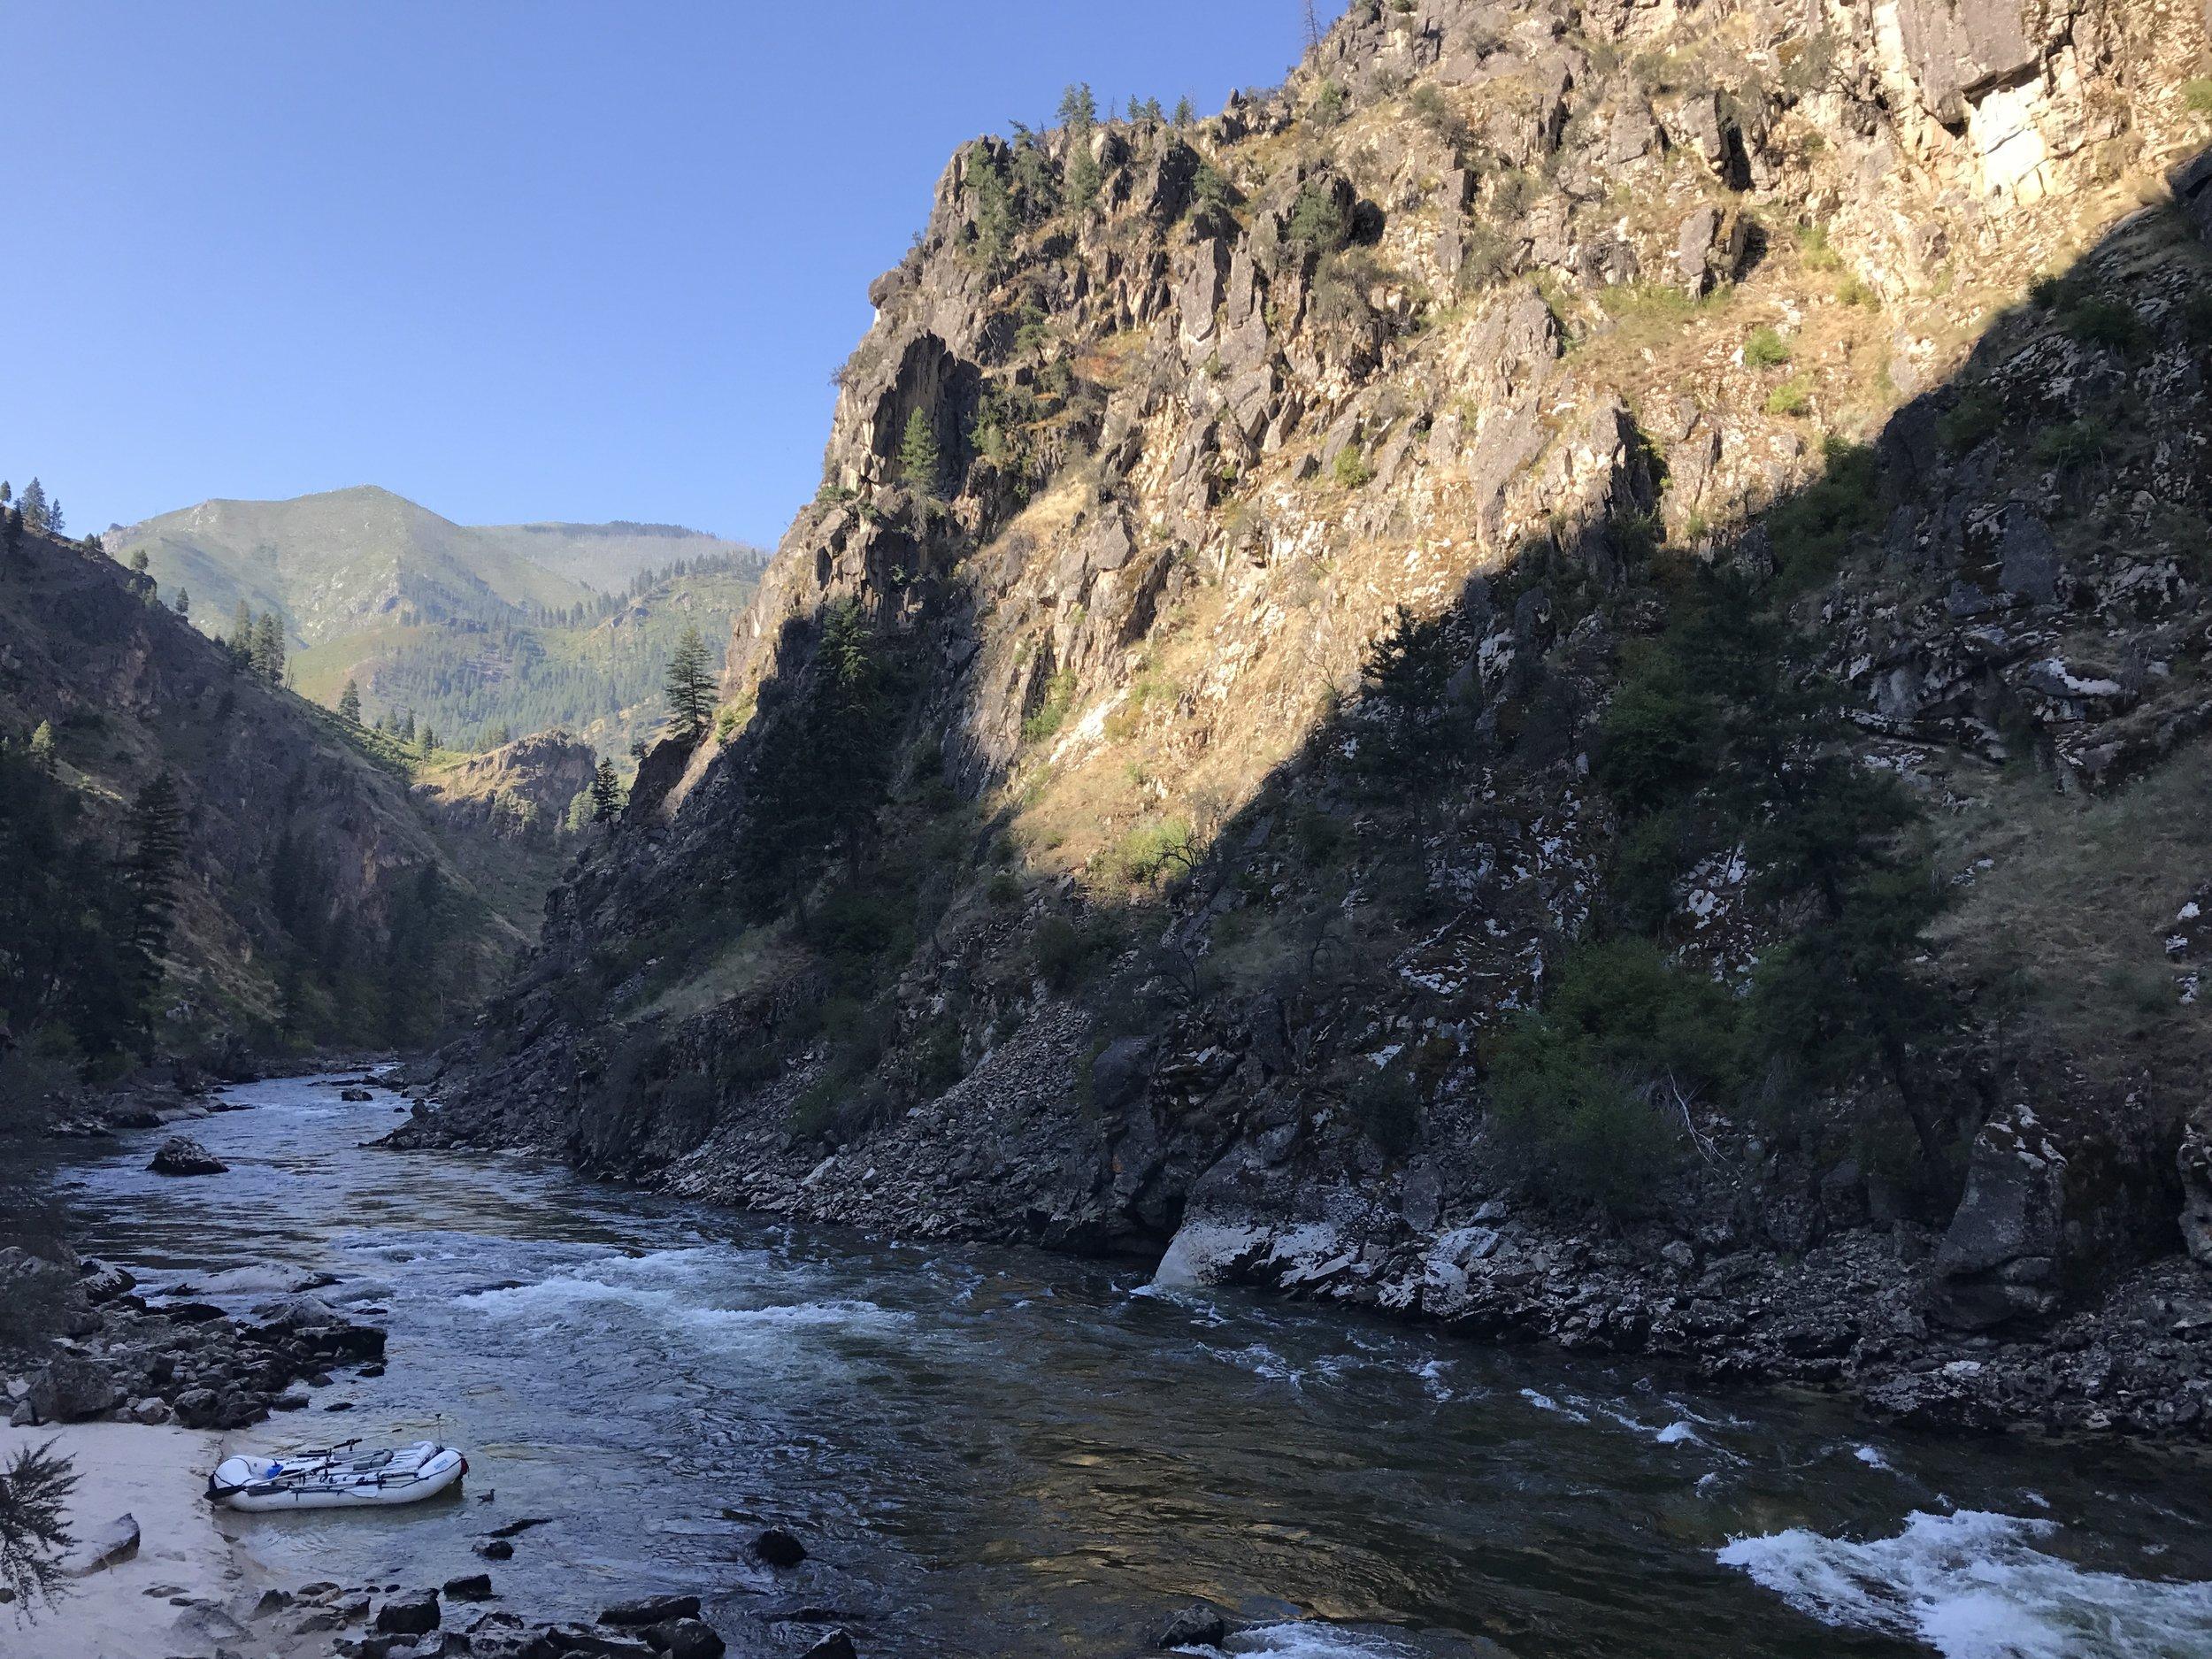 Remote South Fork Salmon River canyon  @Nate Ostis